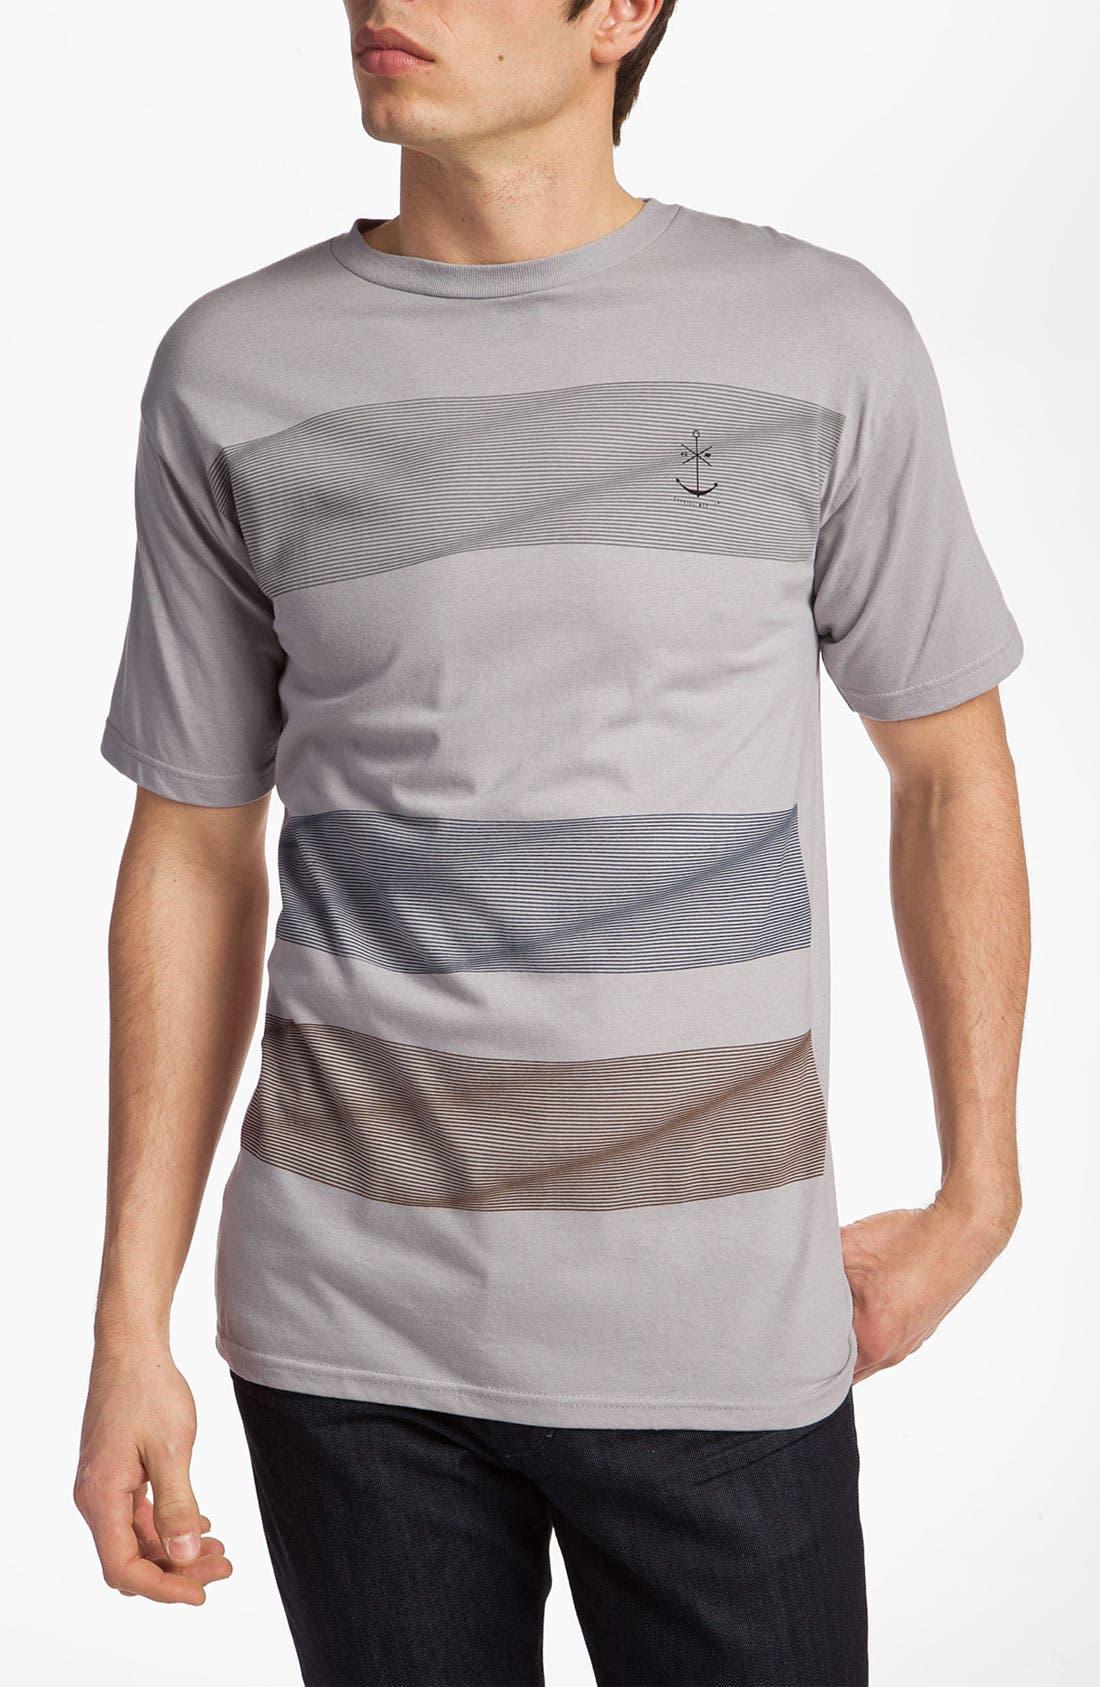 Alternate Image 1 Selected - Ezekiel 'Striation' Slim Fit T-Shirt